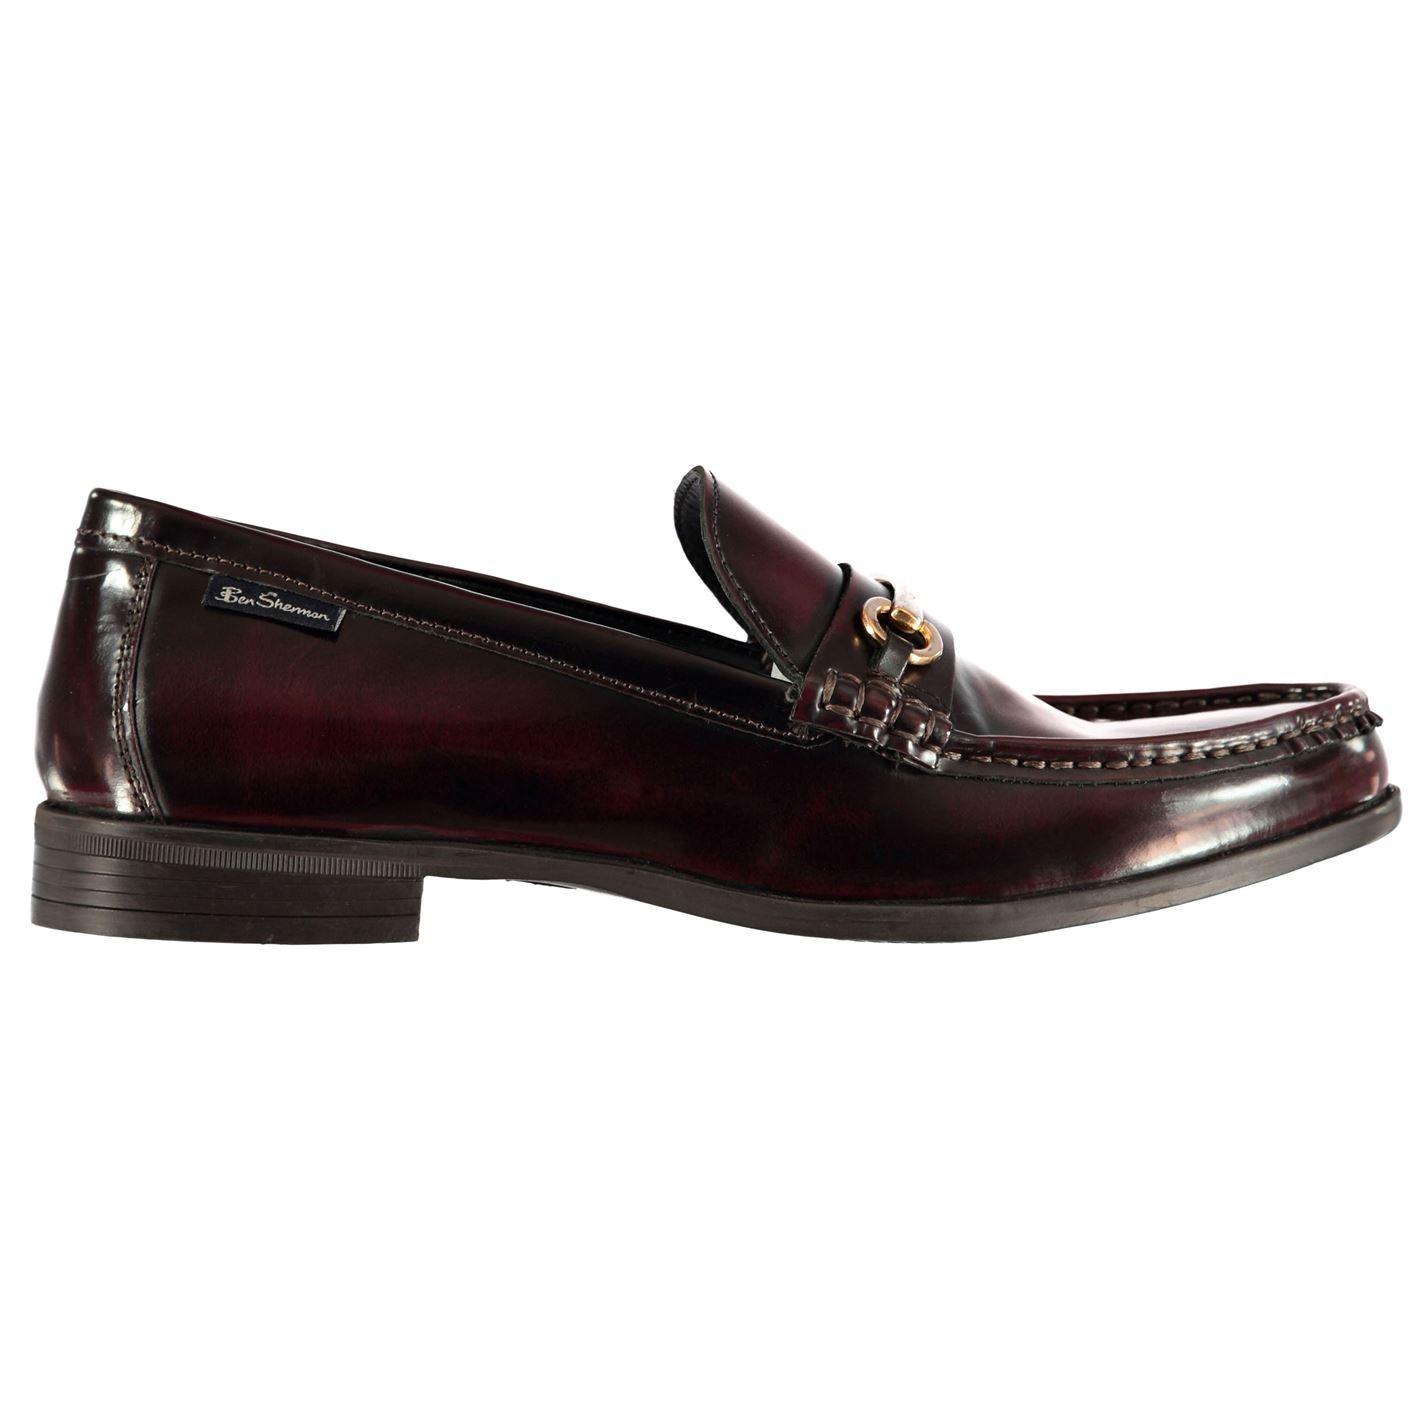 Ben-Sherman-Luca-Loafers-Slip-On-Shoes-Mens-Formal-Footwear-Flats thumbnail 9